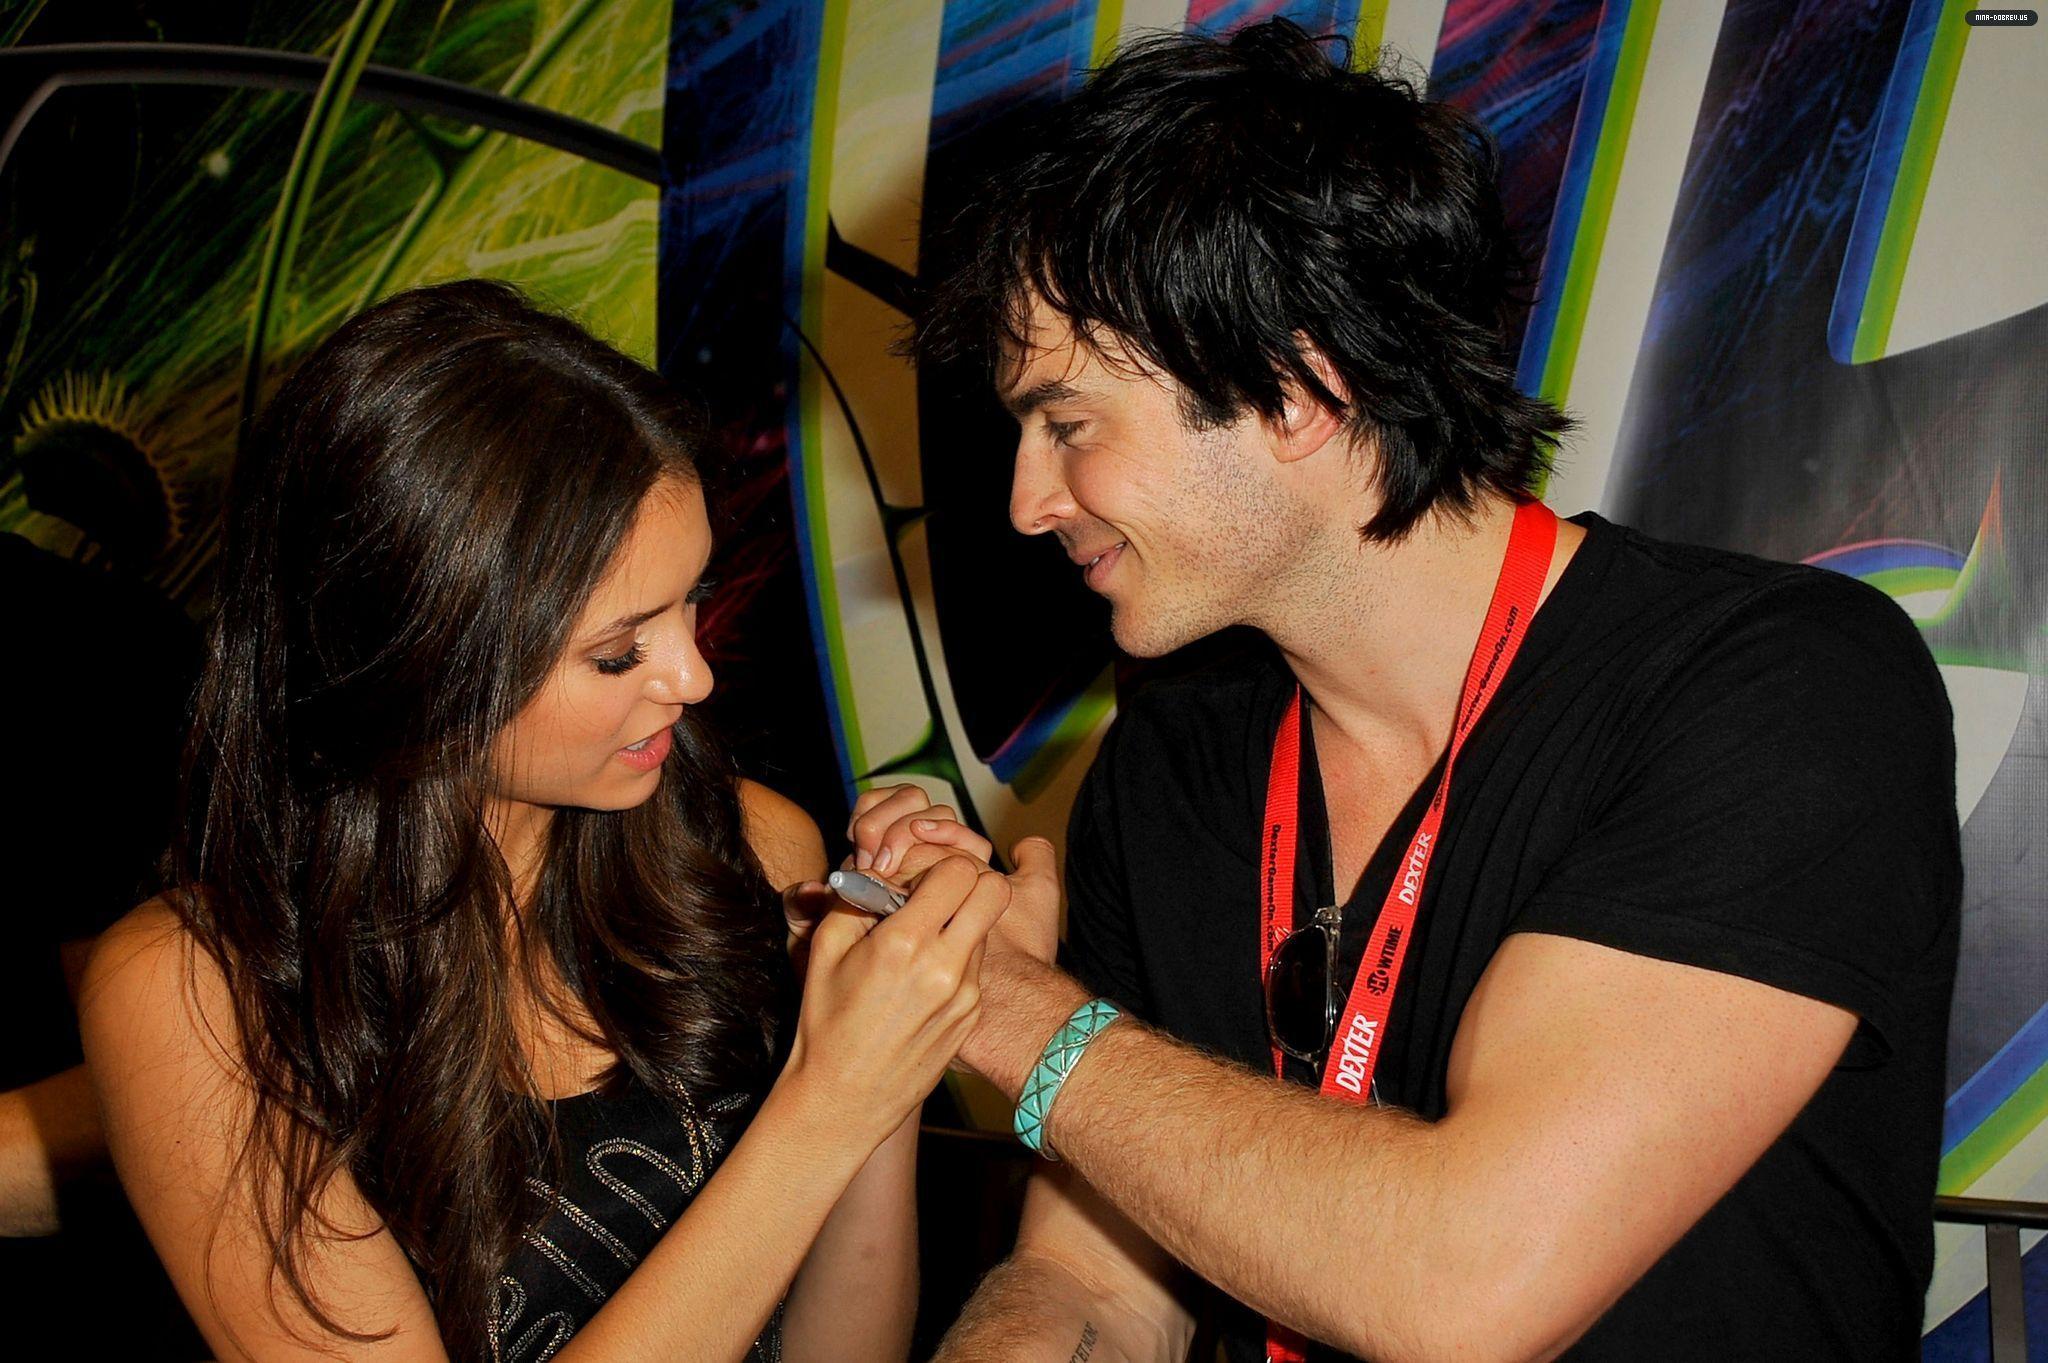 ian somerhalder and nina dobrev dating 2010